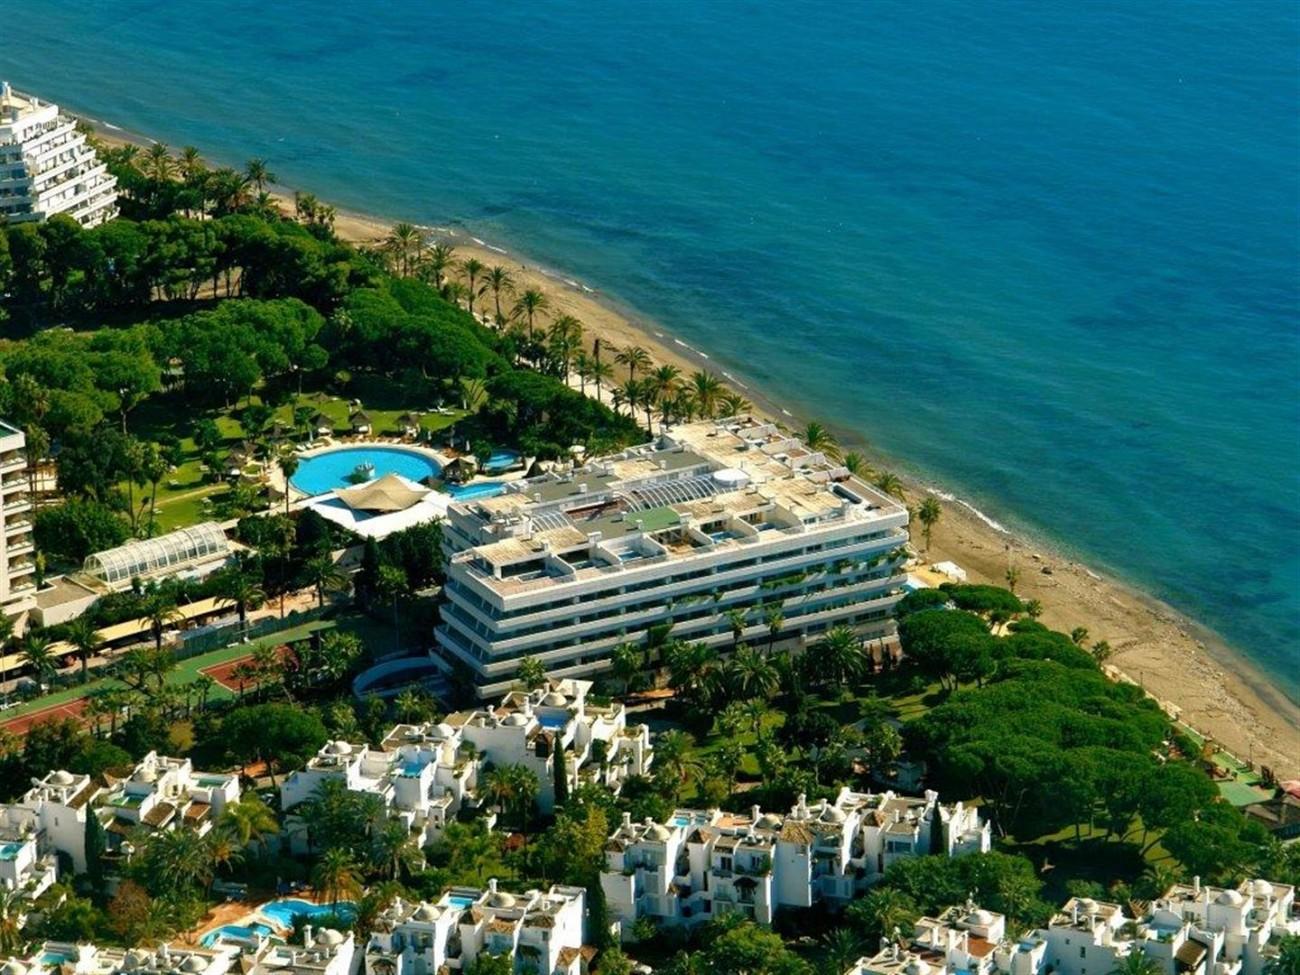 A5579 Frontline beach duplex penthouse Marbella 8 (Large)